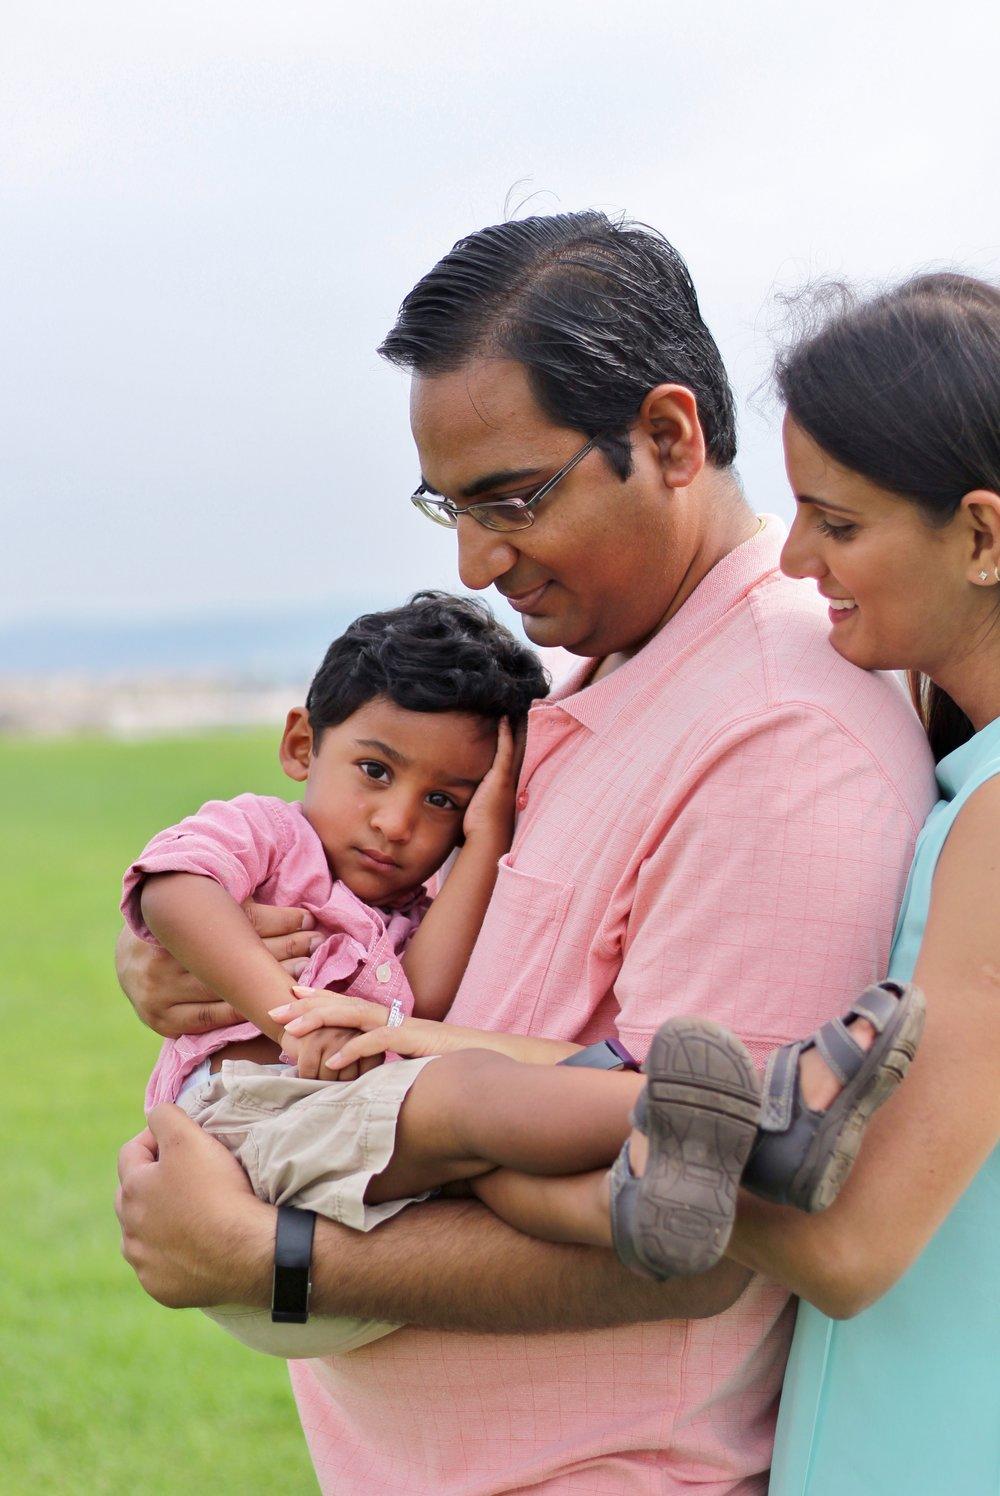 Patel Family Traverse City August 2018 (24).JPG